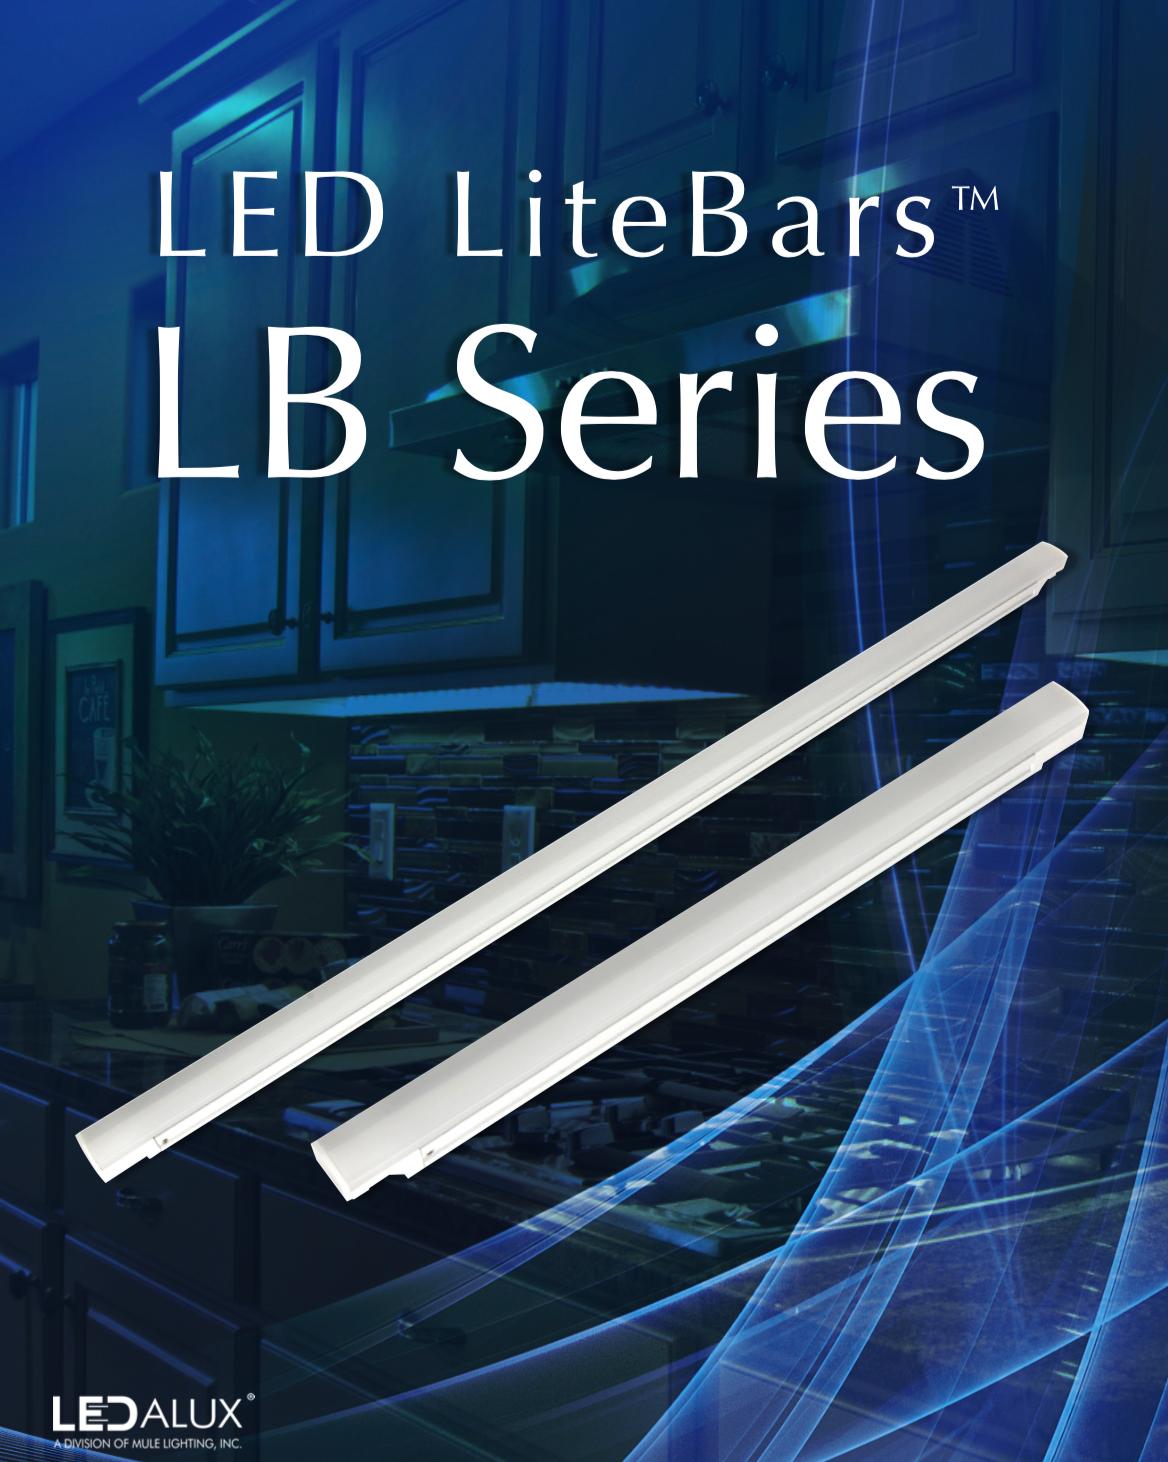 LEDalux LED LiteBars LB Series Literature